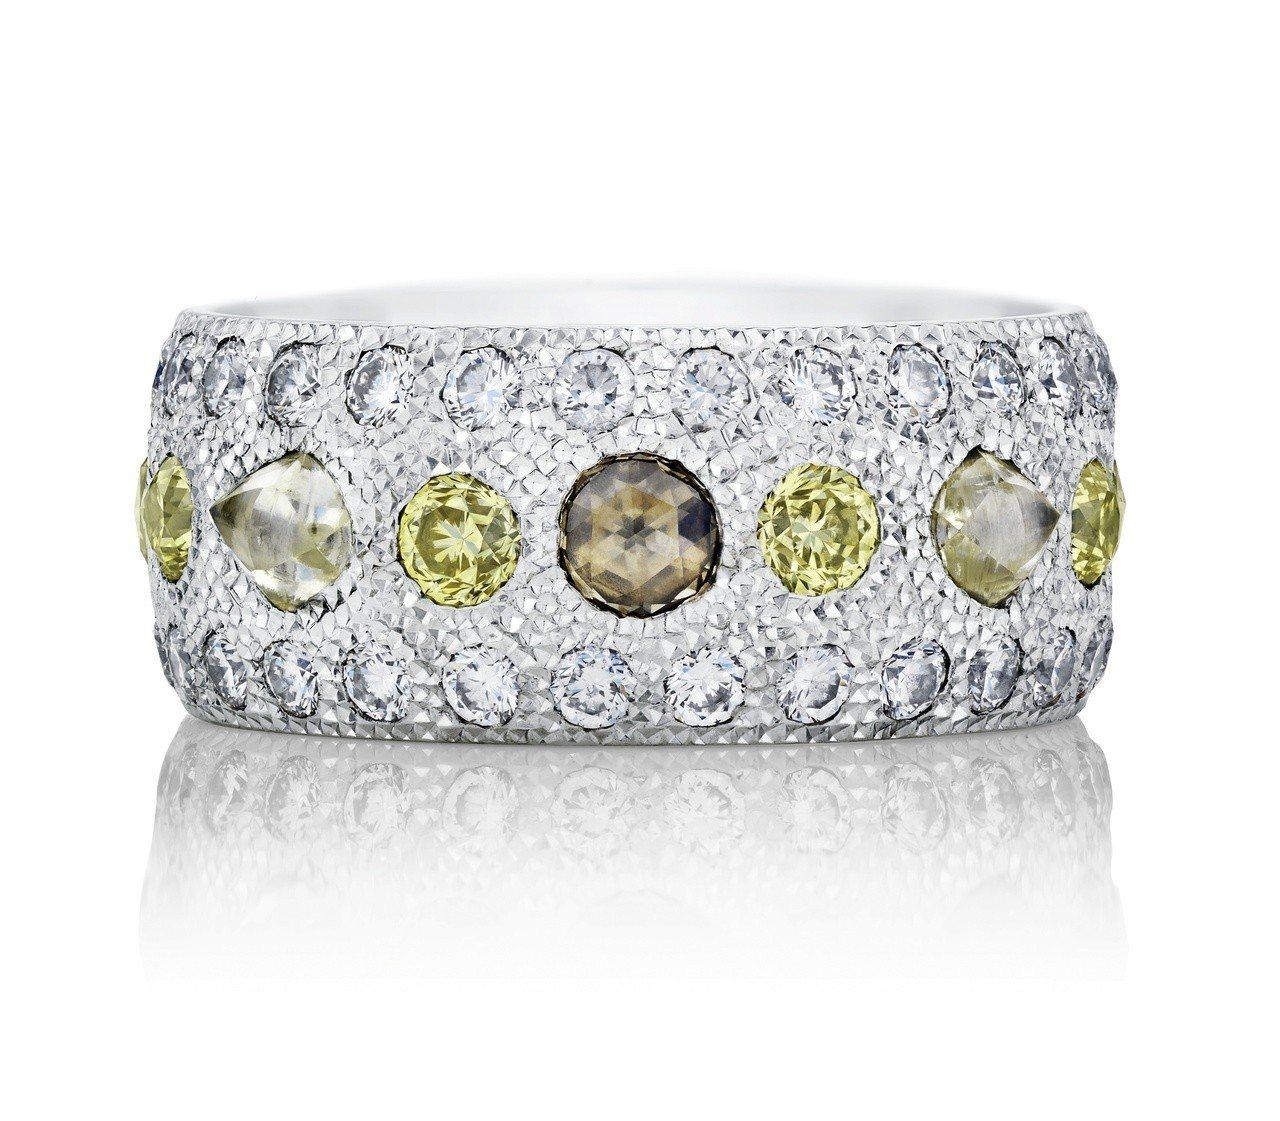 De Beers Talisman 18K白金全鑲鑽戒環,鑽石總重約2.15克拉...